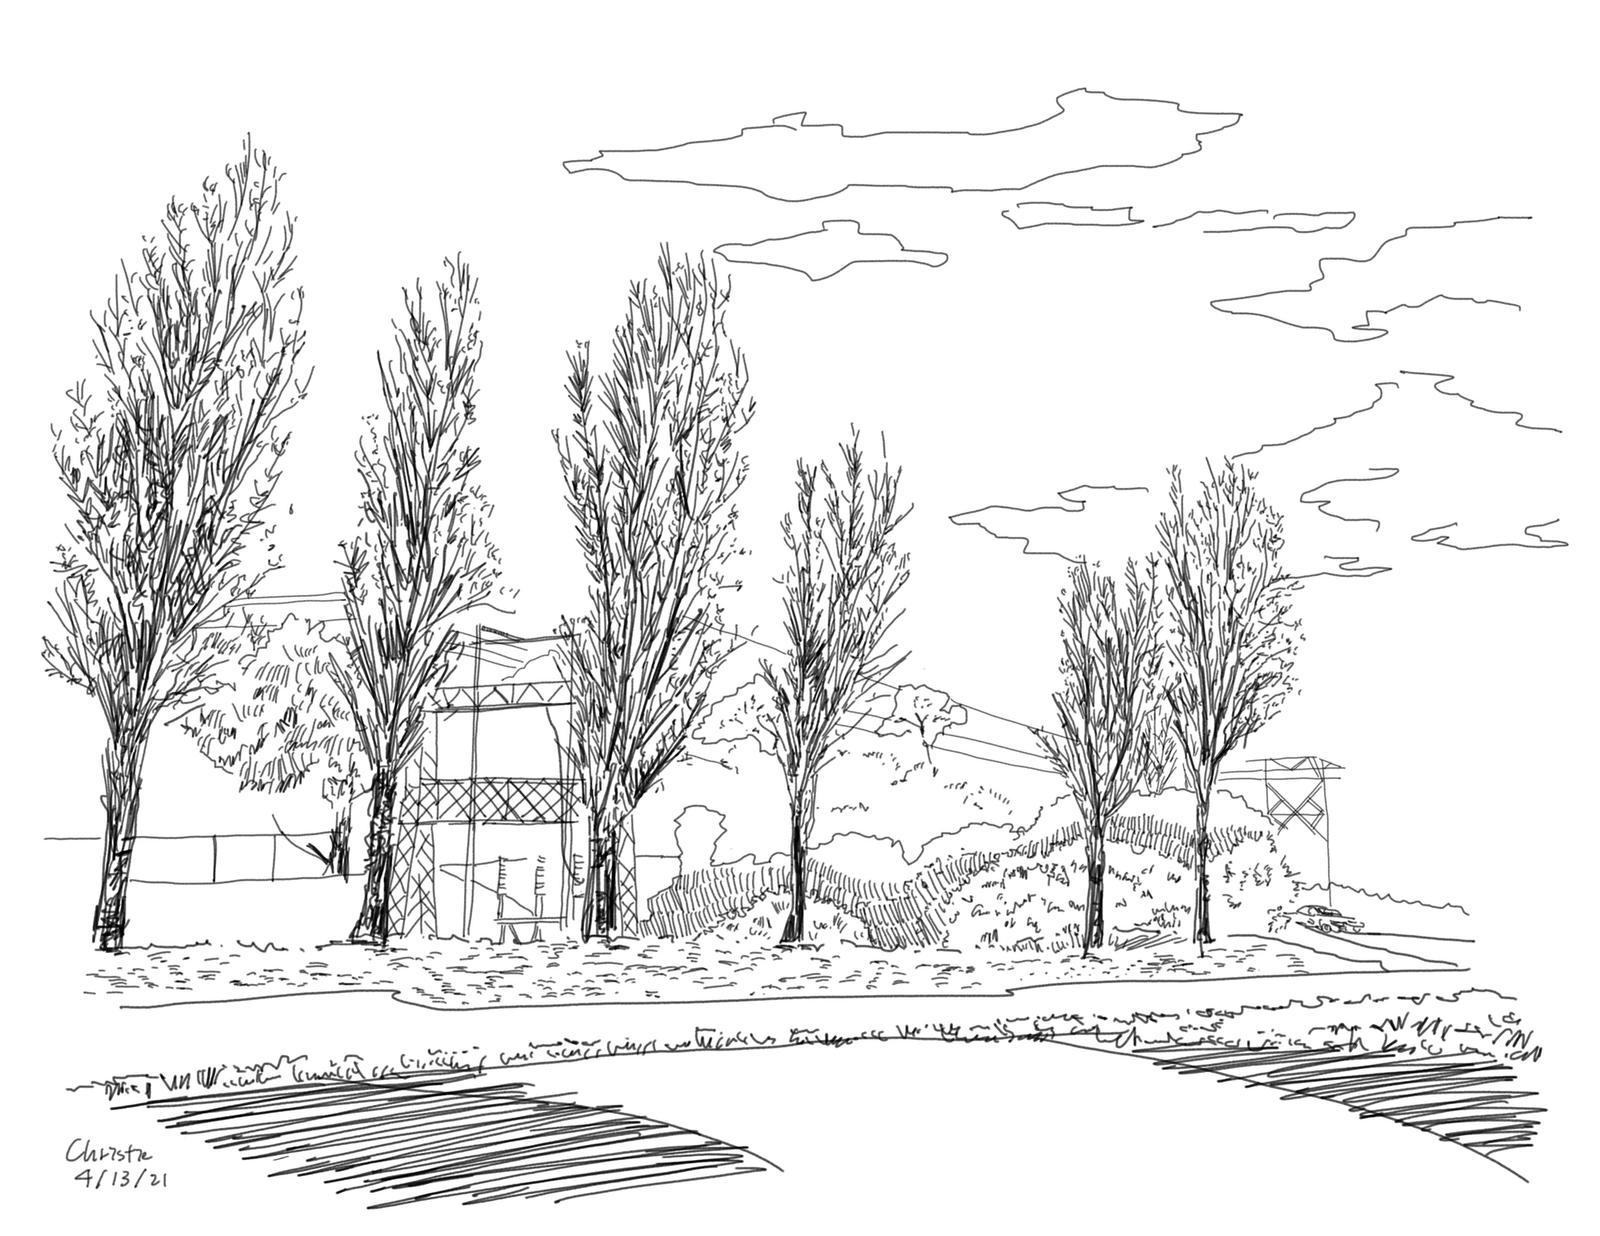 India Basin Park, San Francisco - Site Inventory Sketch 4